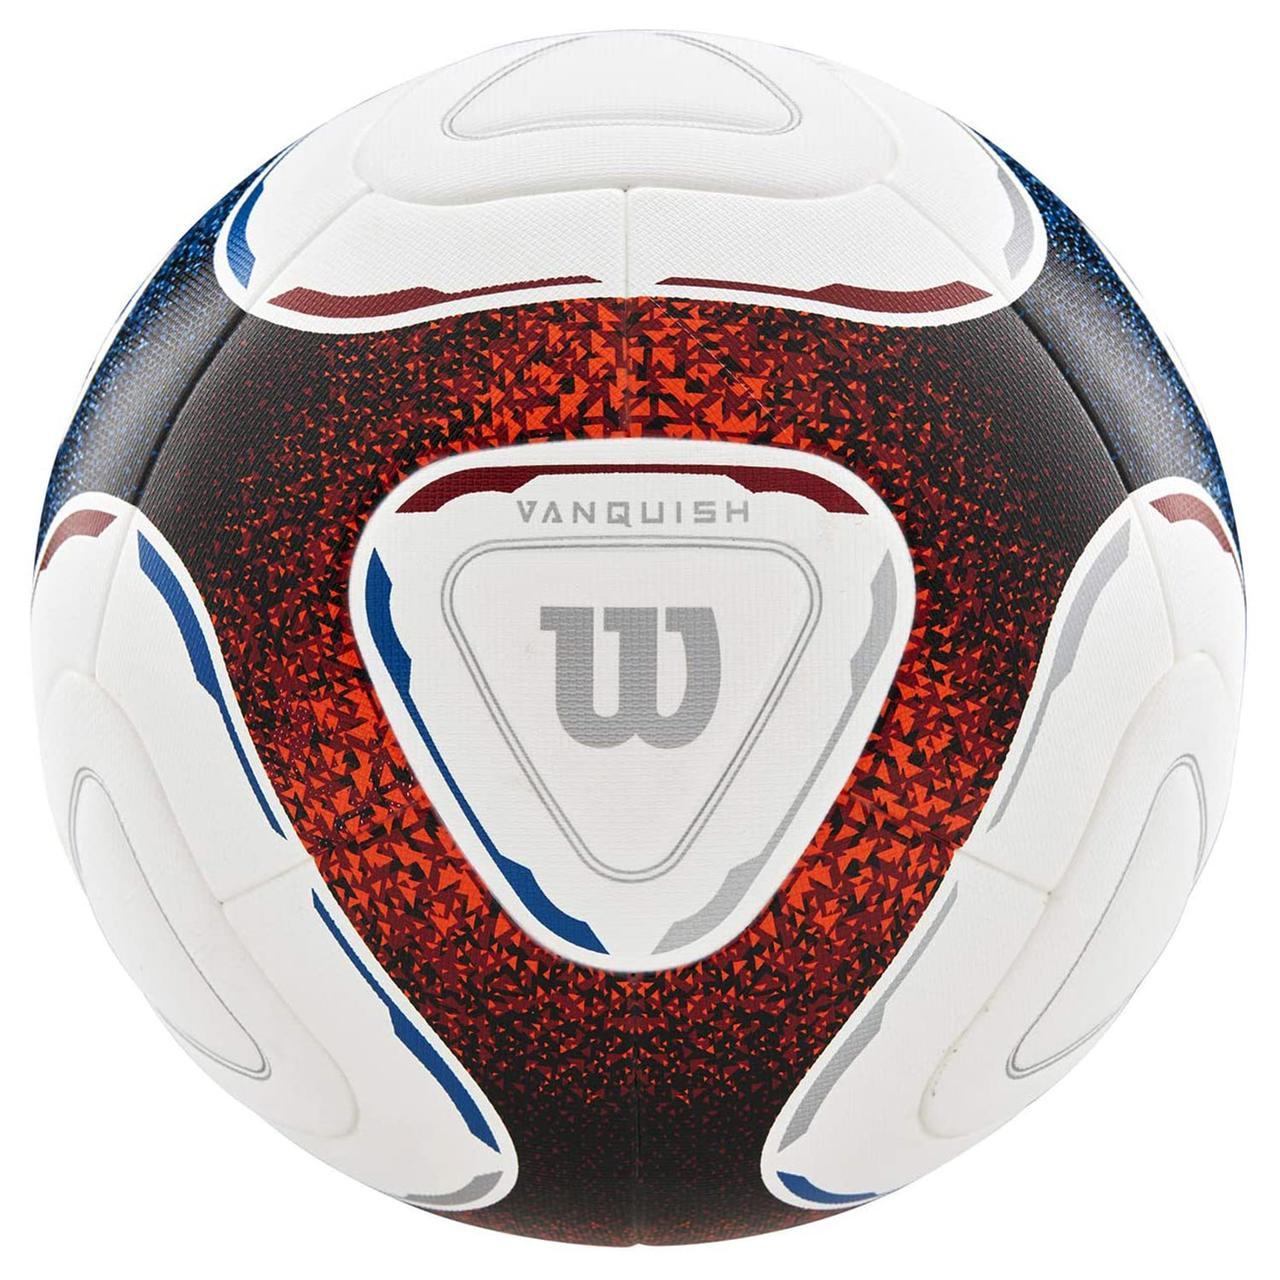 Wilson  мяч футбольный Vanquish